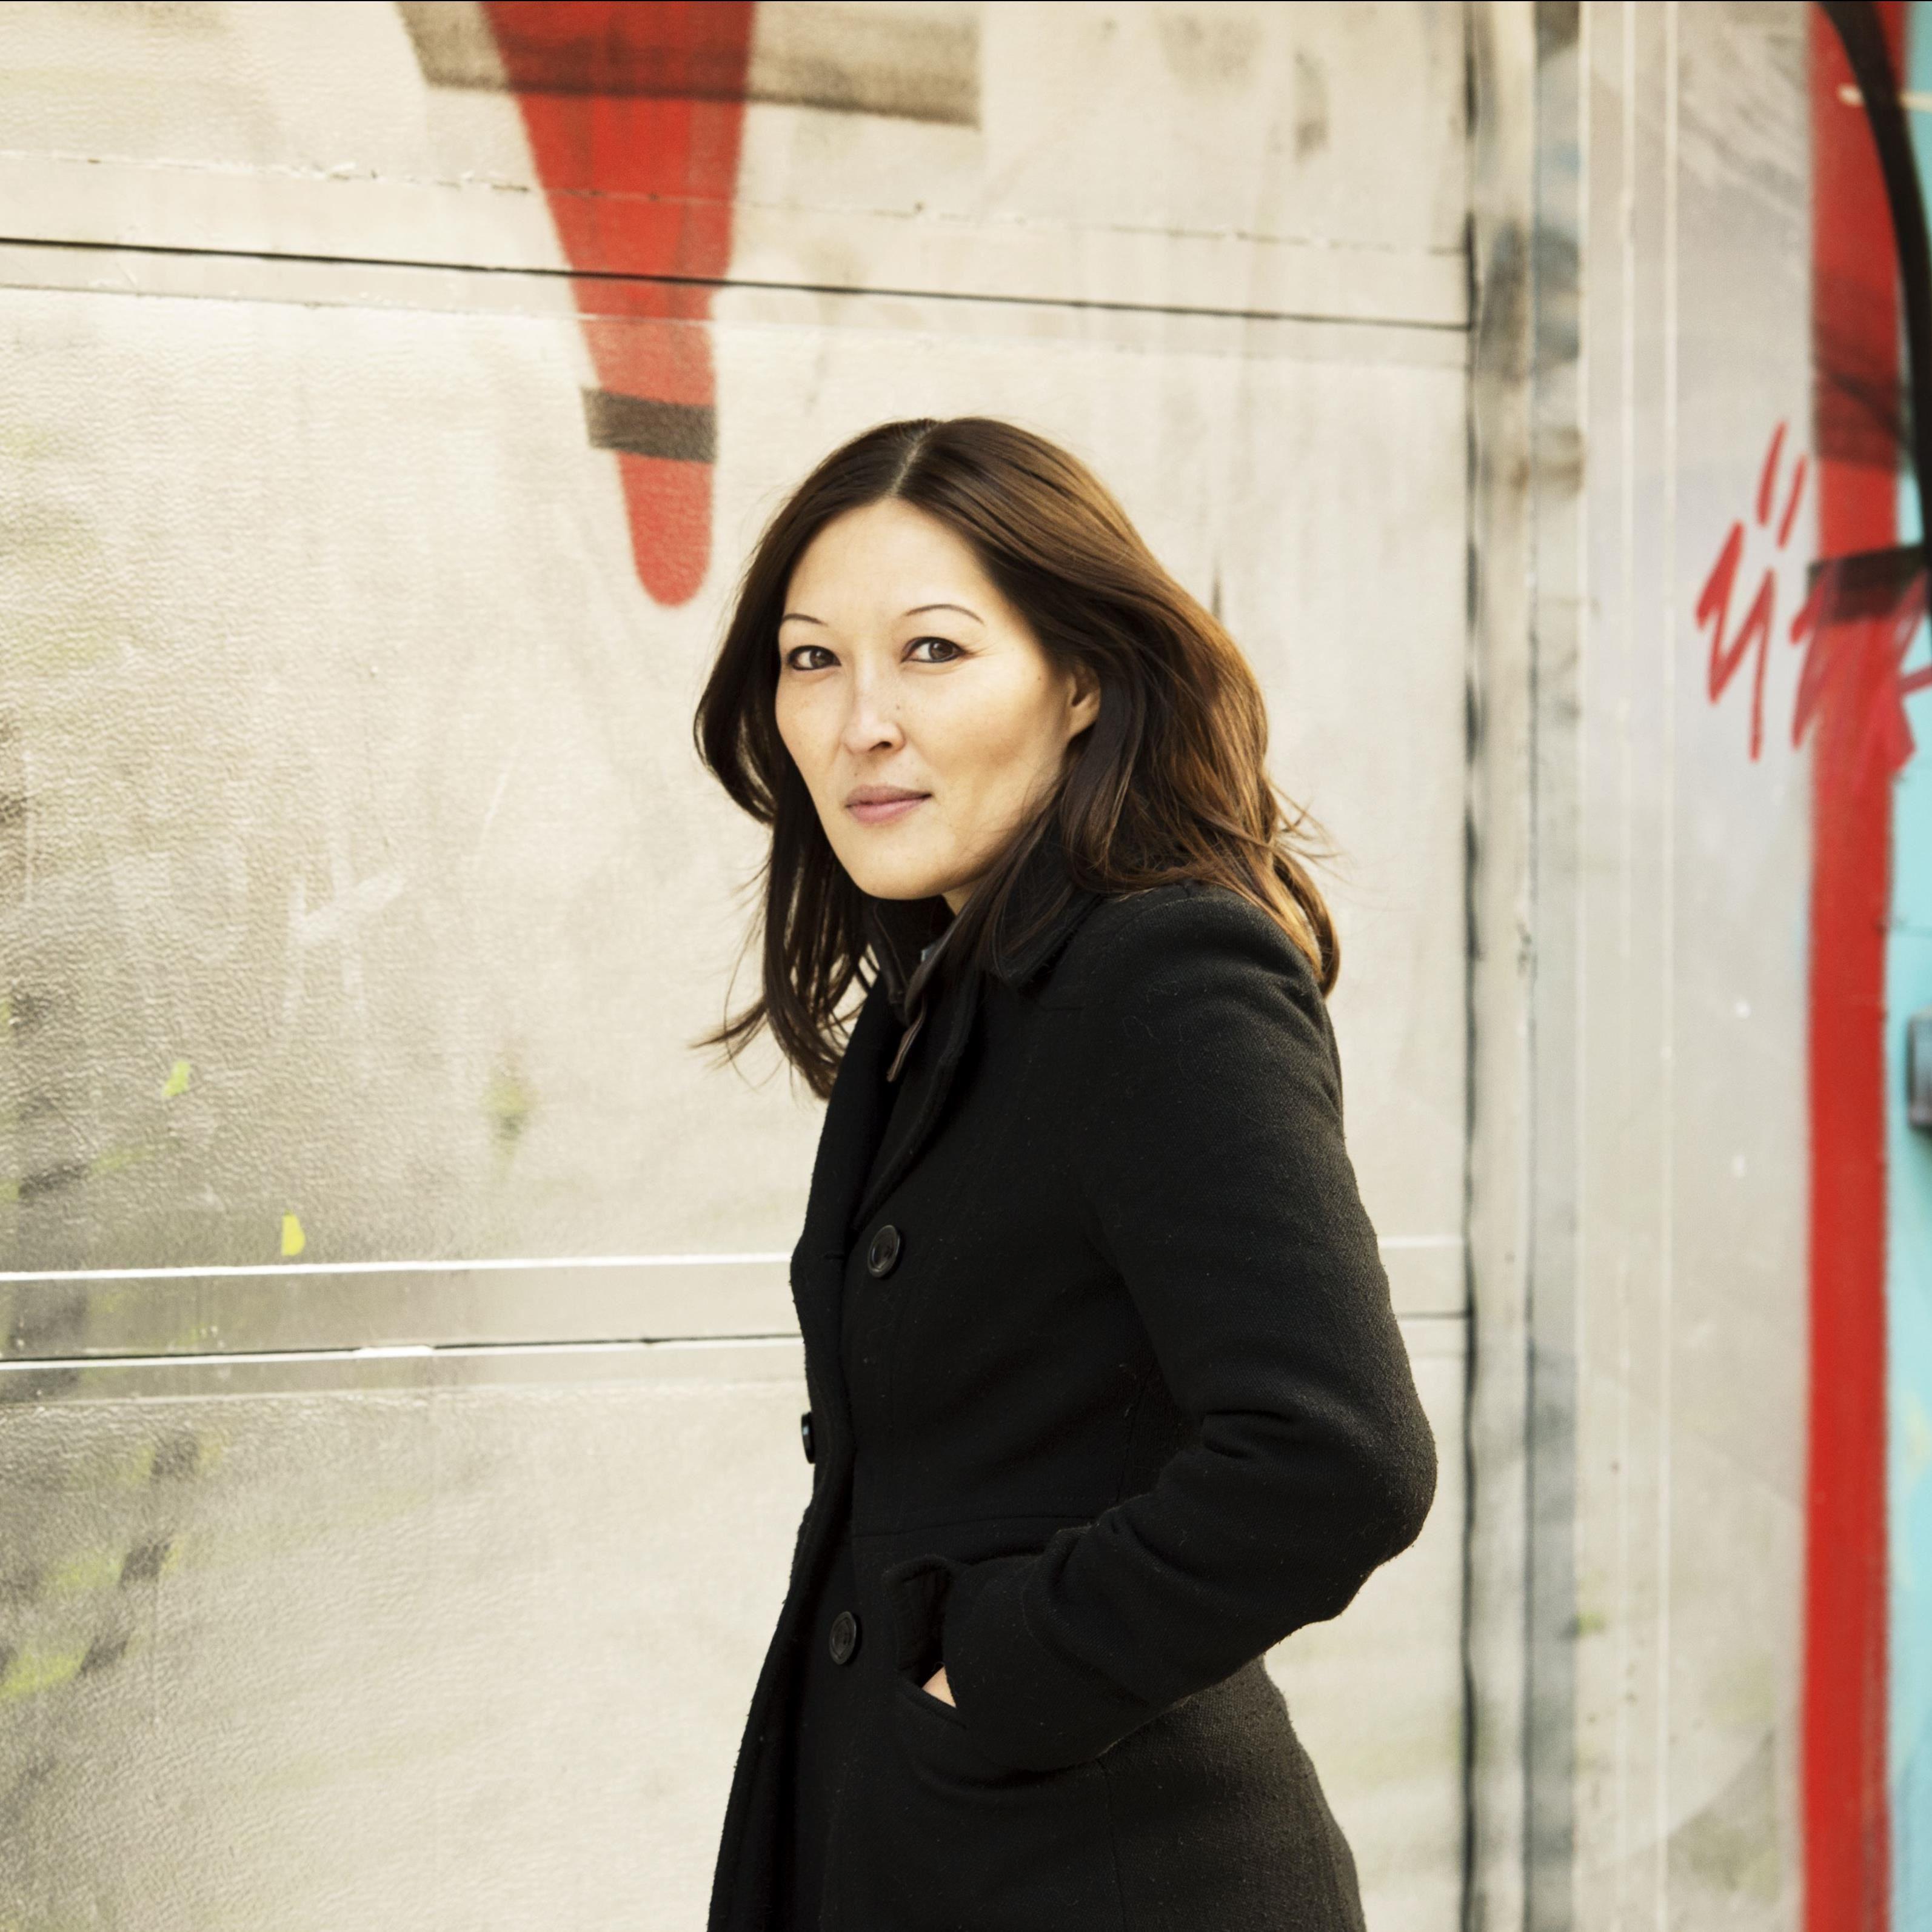 Ola Kjelbye, Författarafton med Lena ten Hoopen